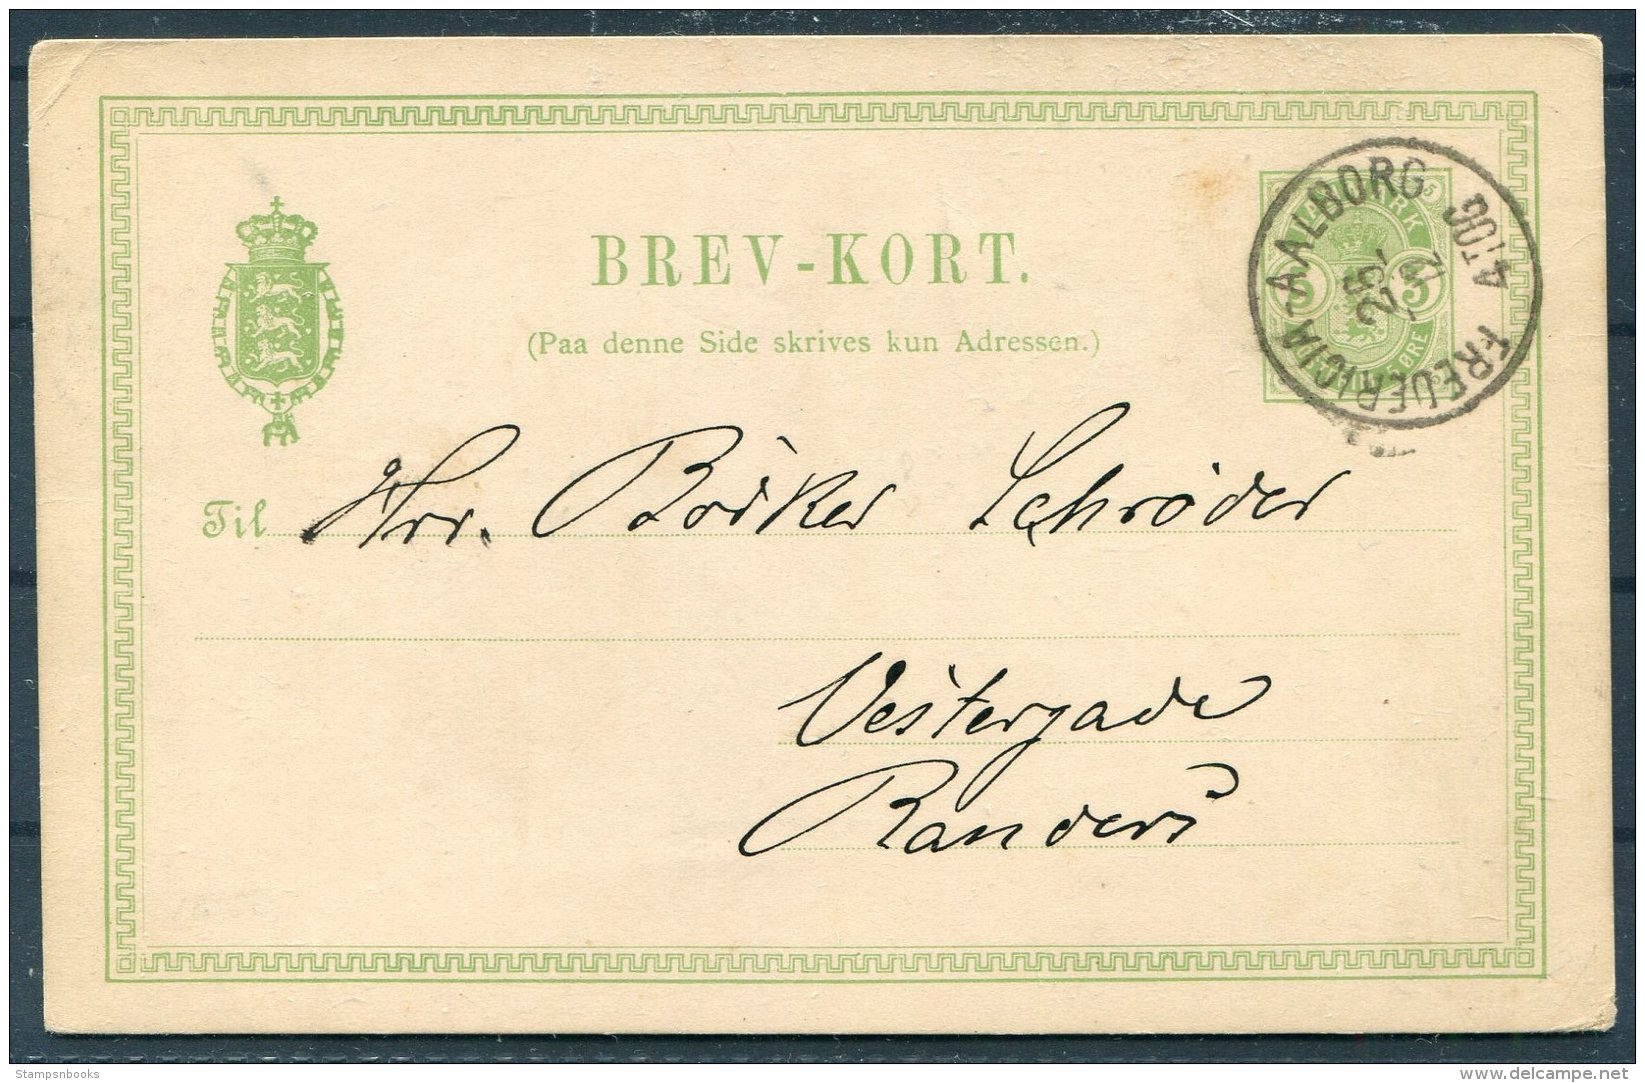 1889 Denmark Stationey Postcard. Vingegaard Pr Onaild Station. Fredericia - Aalborg TPO Railway - Randers - 1864-04 (Christian IX)